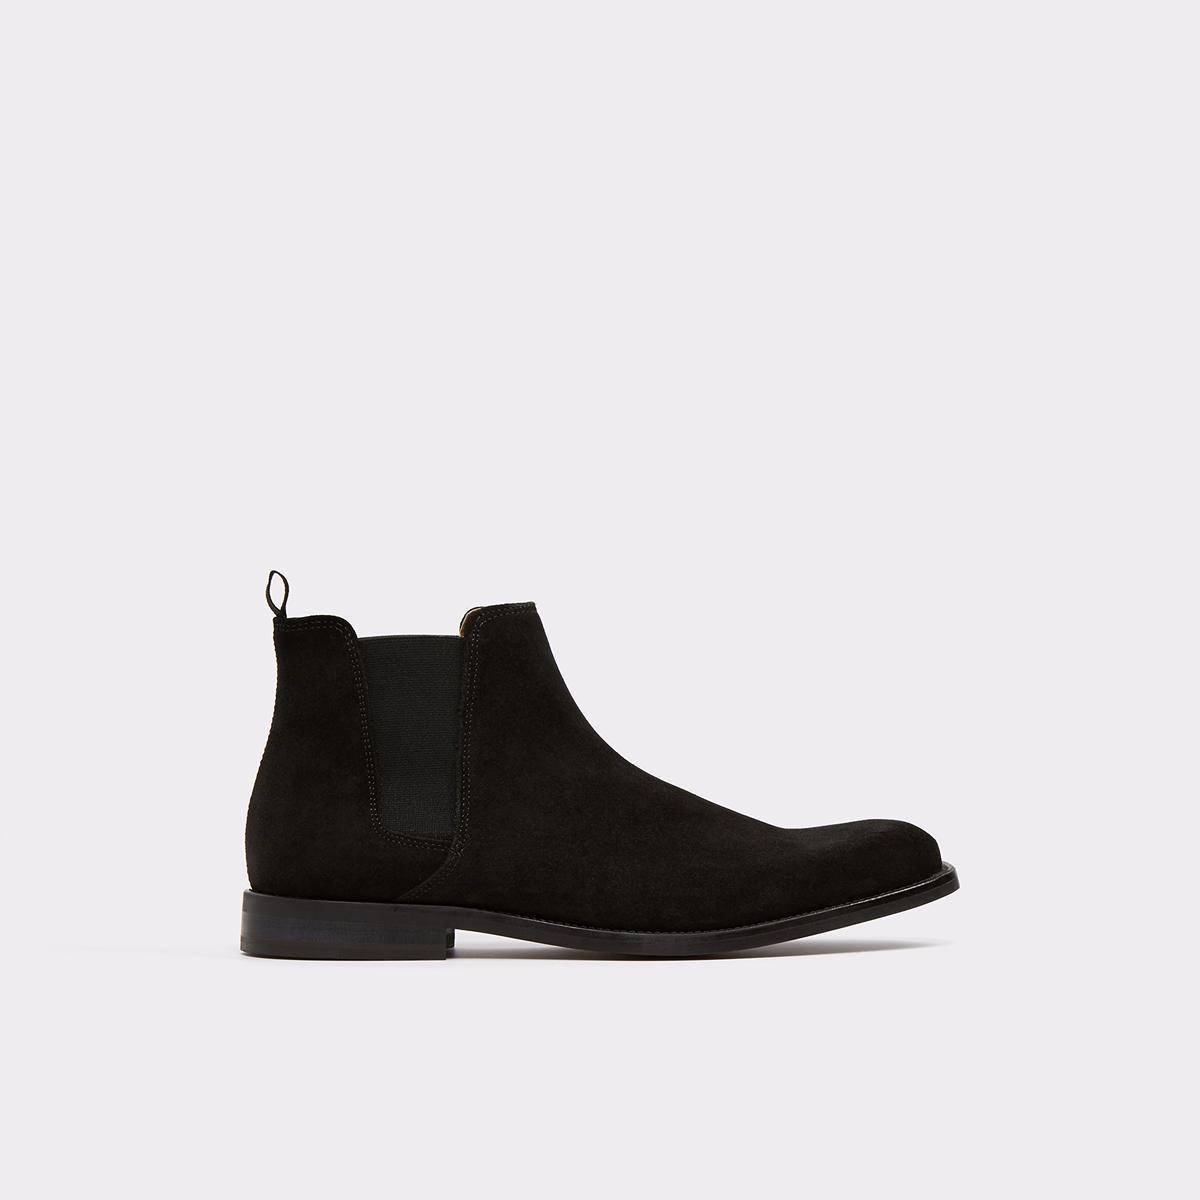 Vianello-R Black Suede Men\'s Dress boots | ALDO US